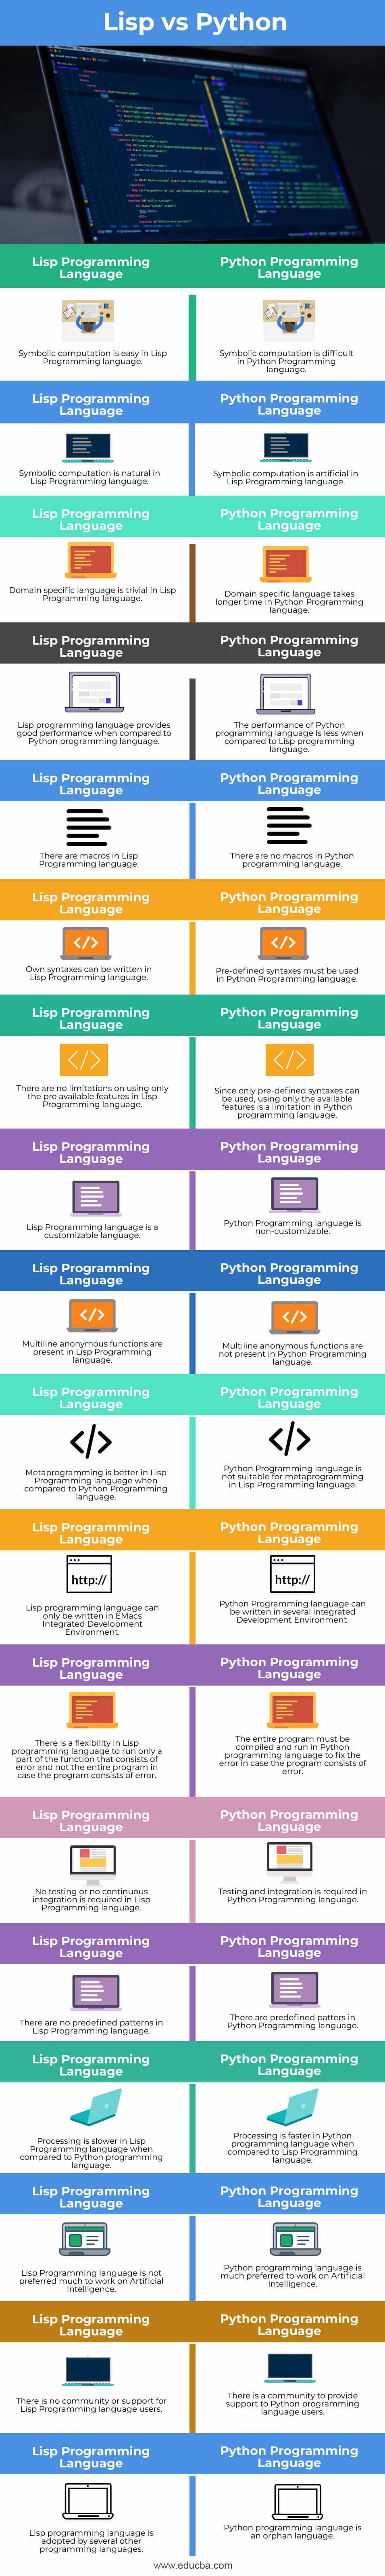 Lisp-vs-Python-info